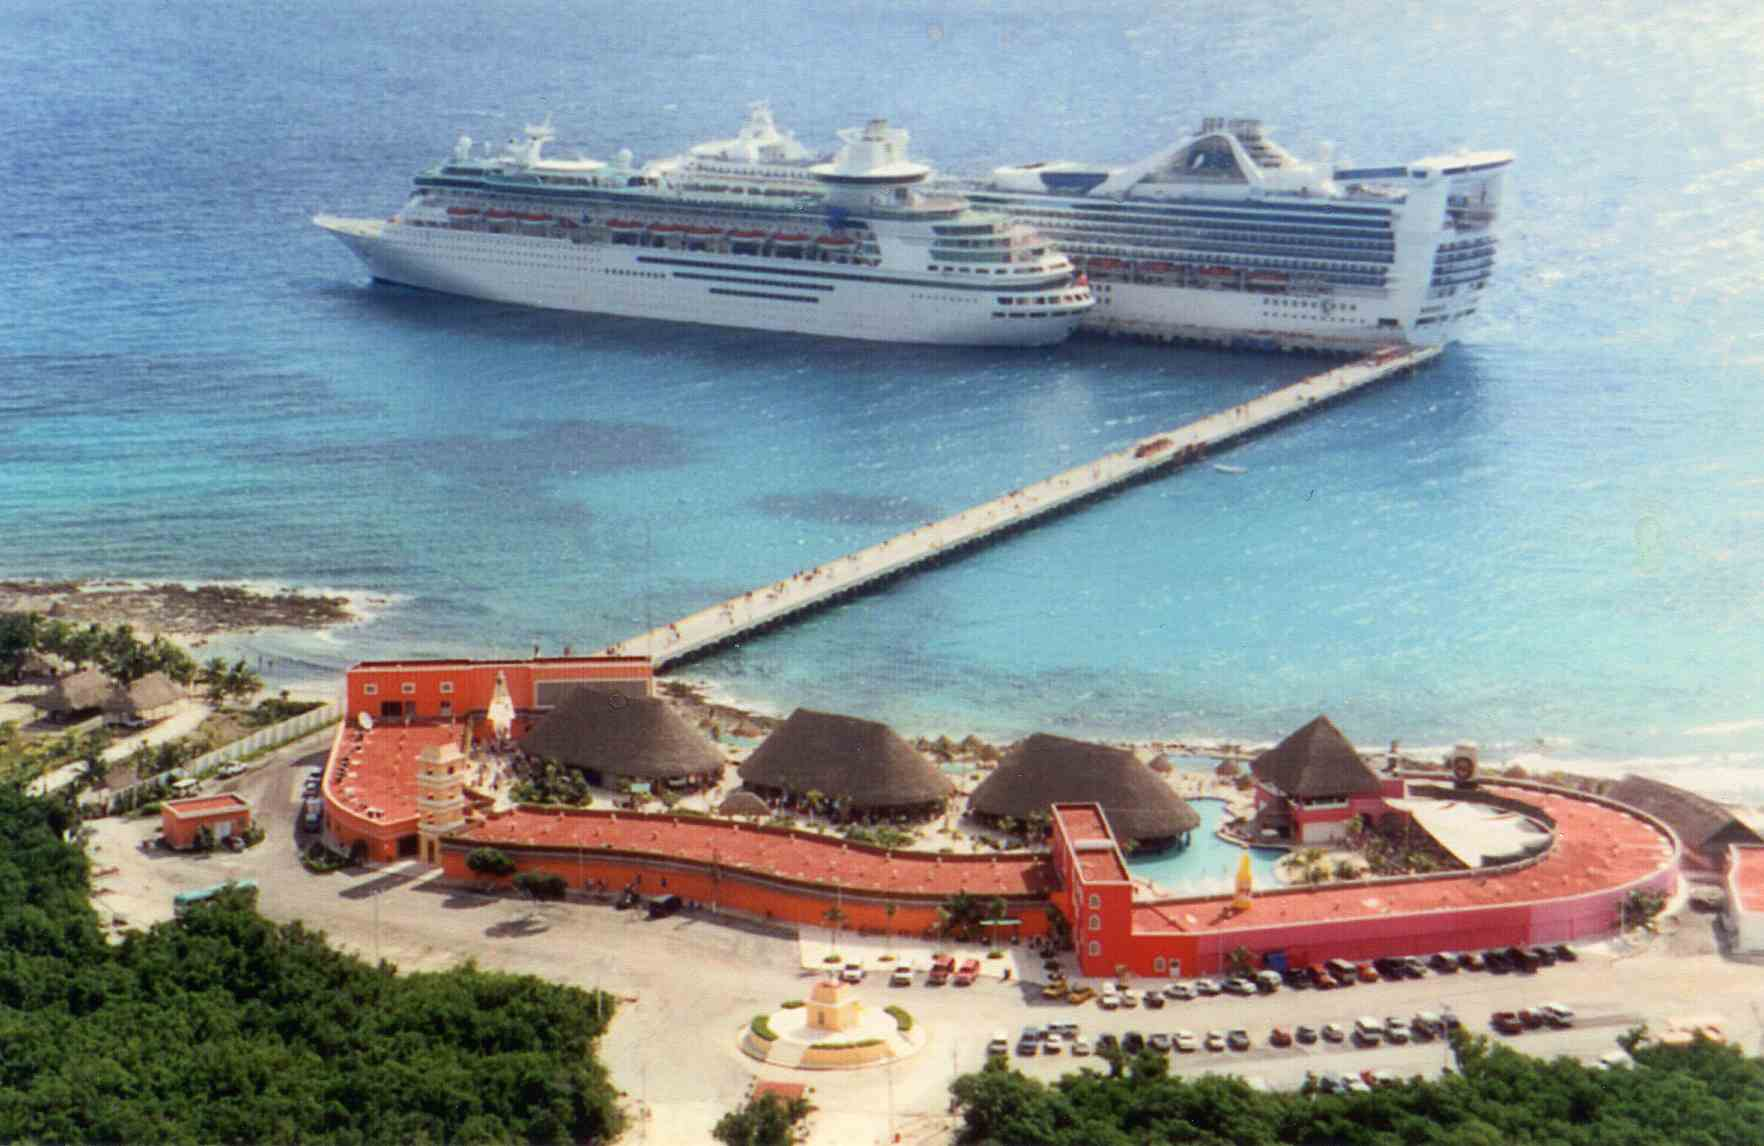 Muelle de cruceros en Mahahual